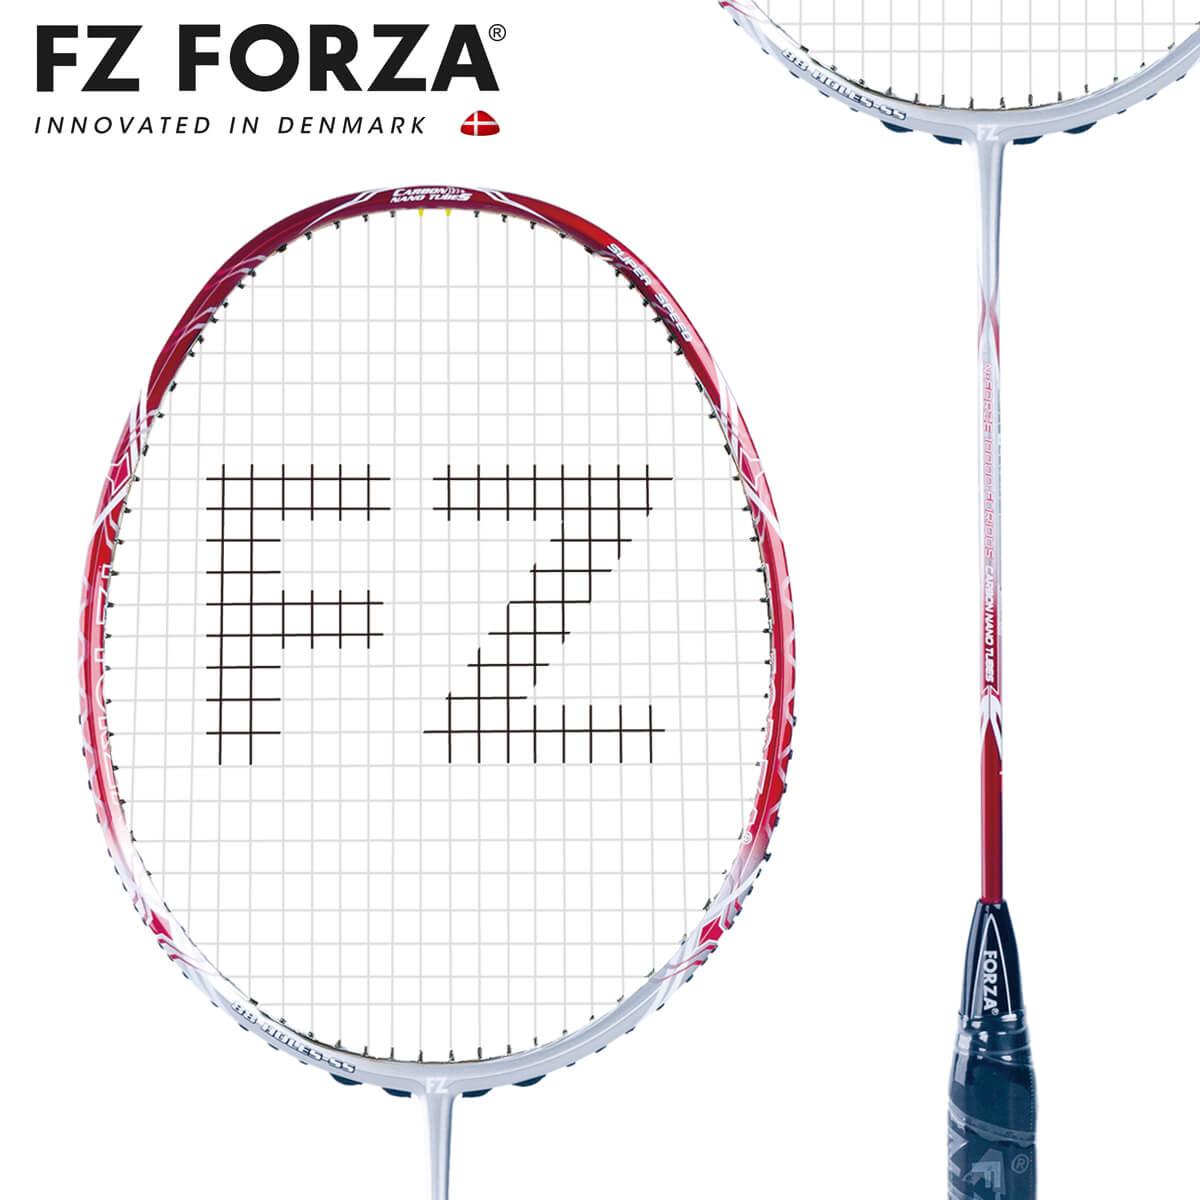 FZ FORZA N-FORZE 10000 FURIOUS 88ホール FZ フォーザ バドミントンラケット【オススメガット&ガット張り工賃無料】